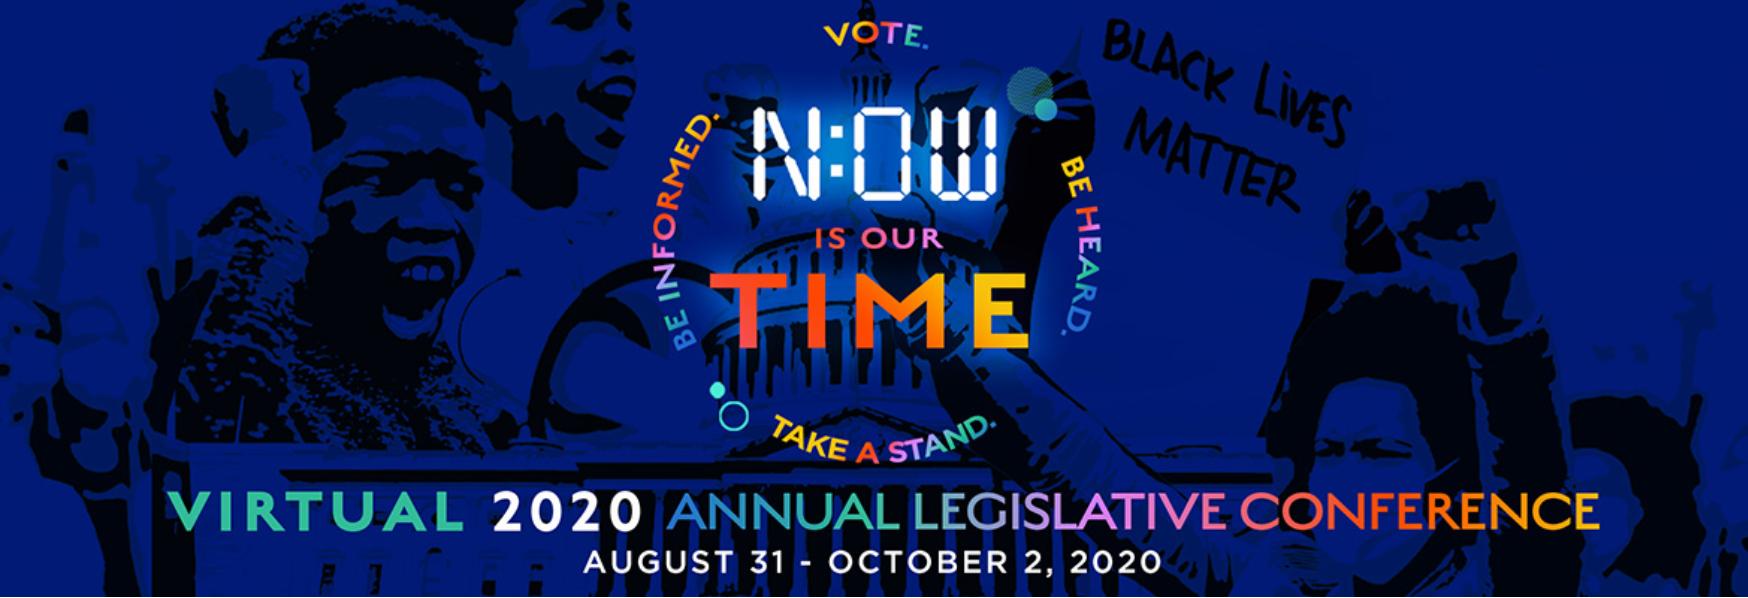 Flyer for 2020 Annual Legislative Conference